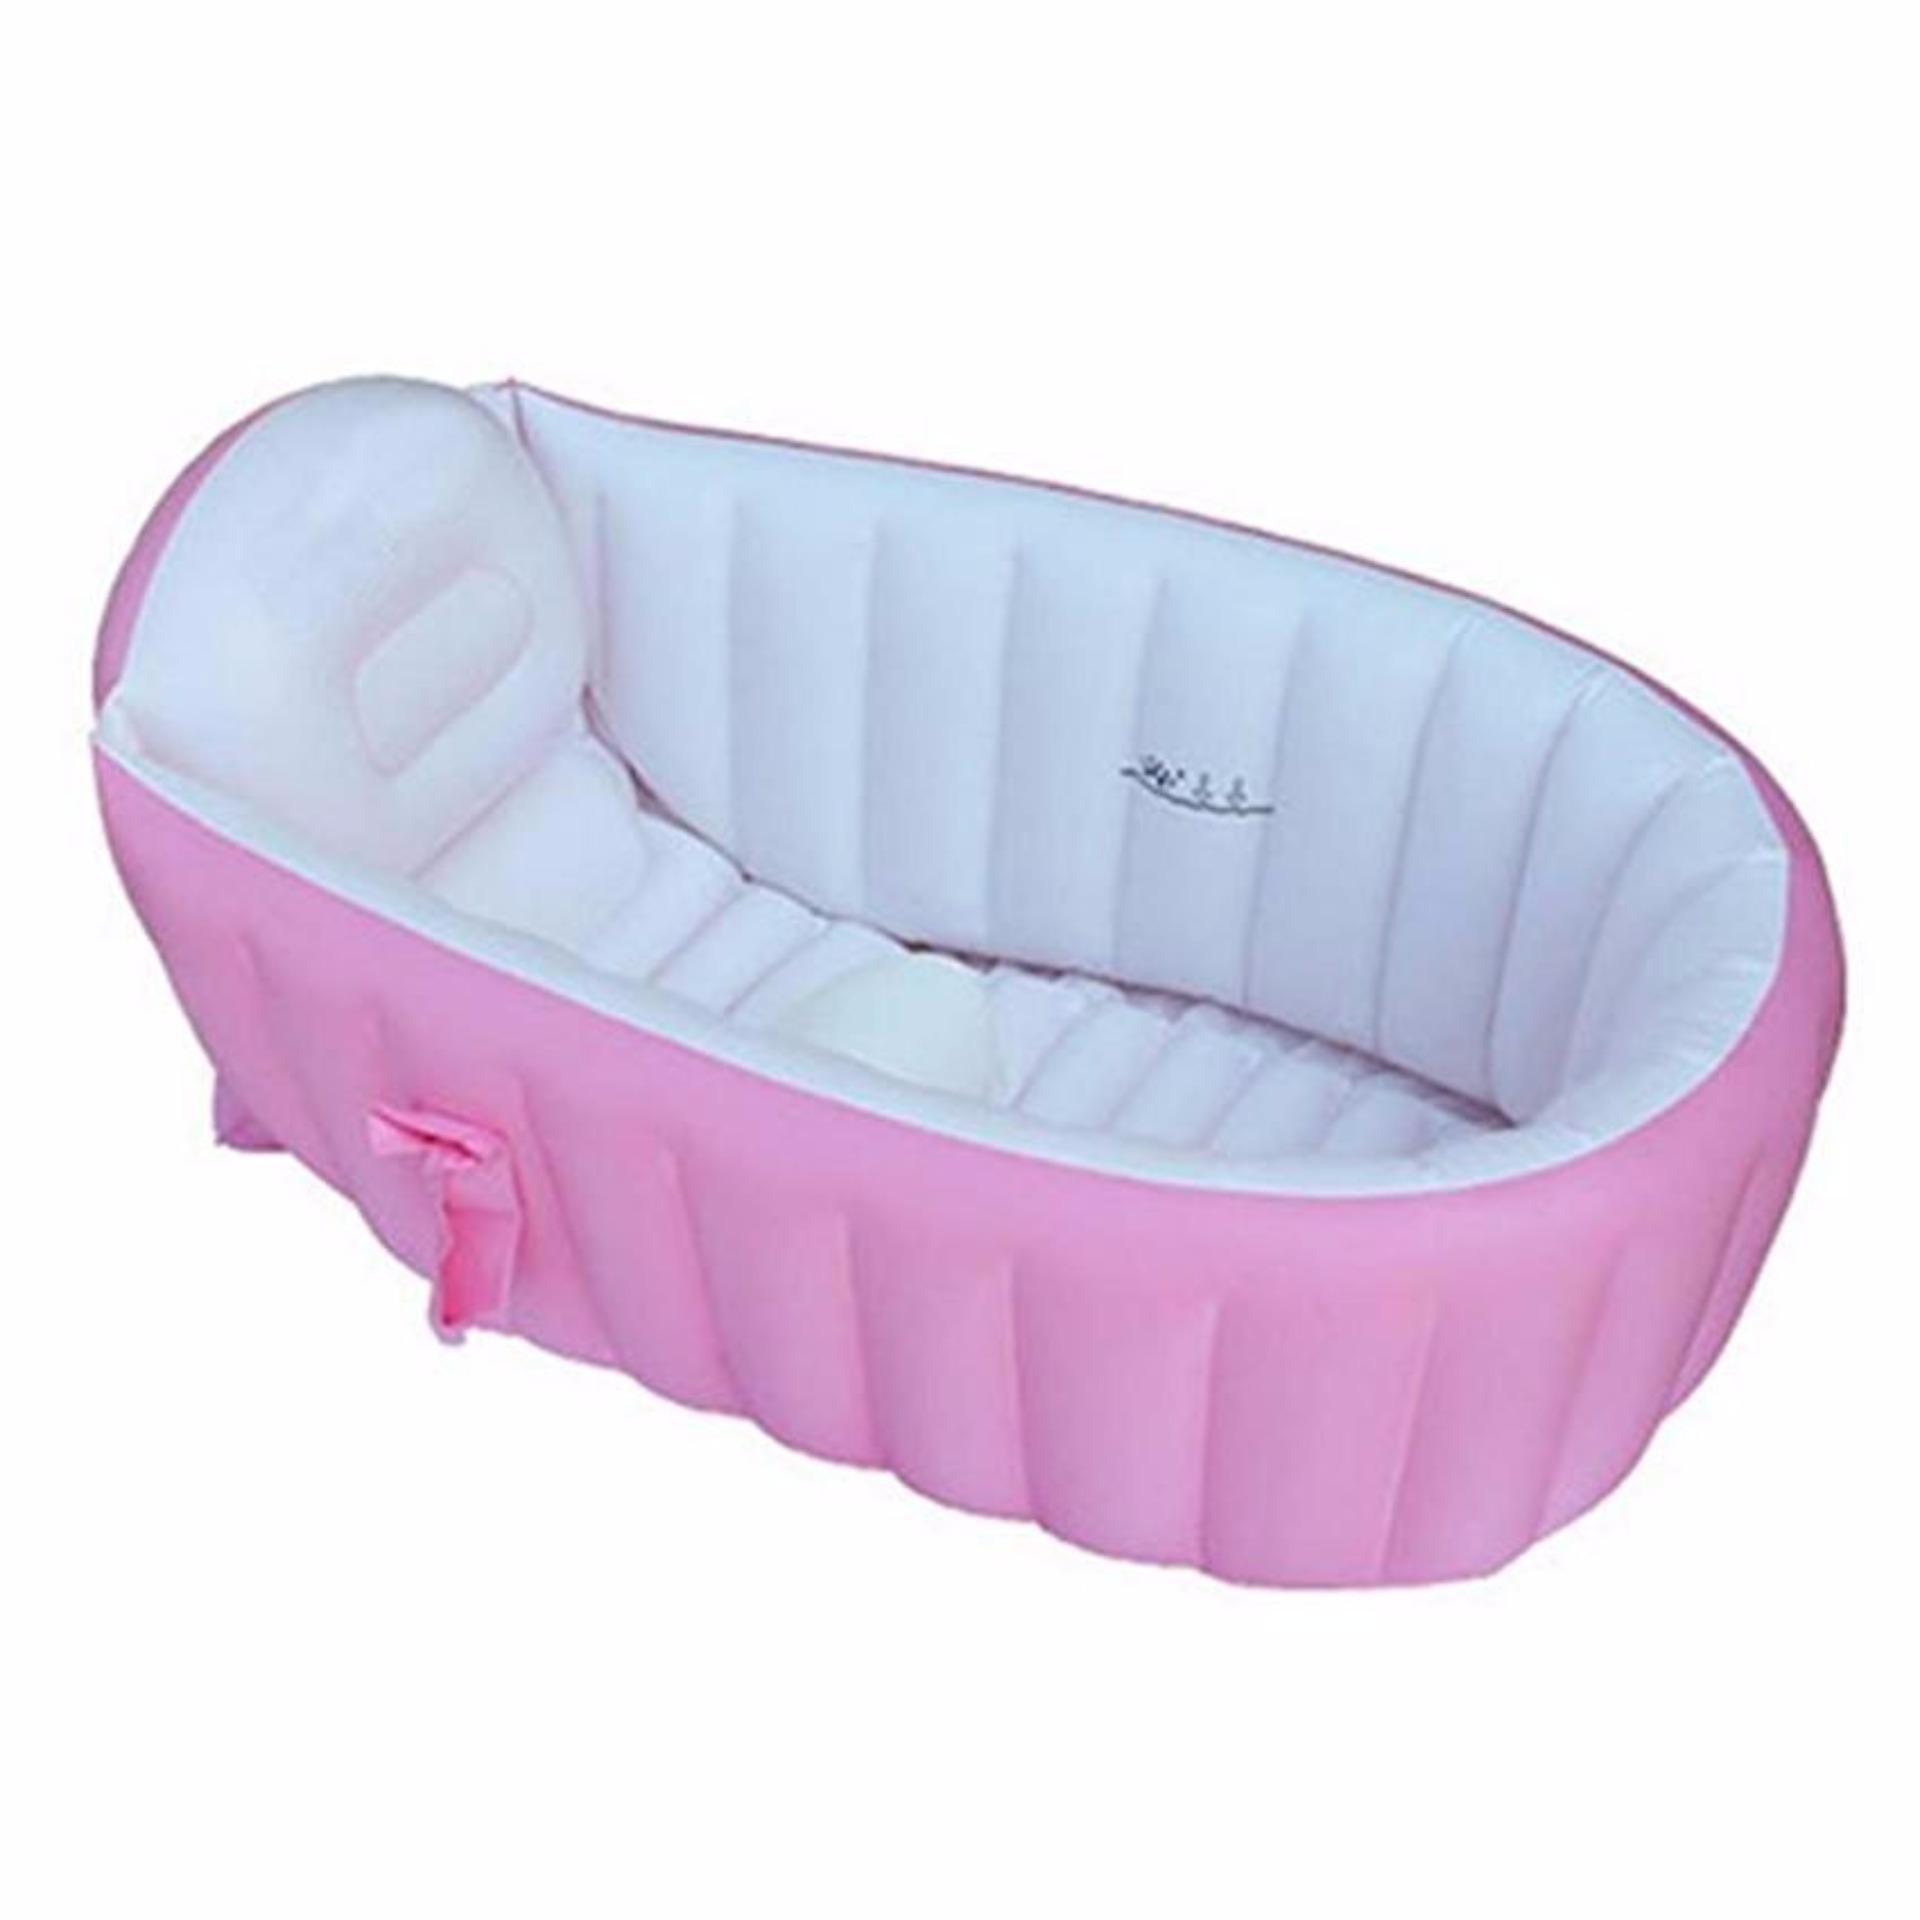 Inflatable Baby Bath Tub (Pink) | Lazada PH